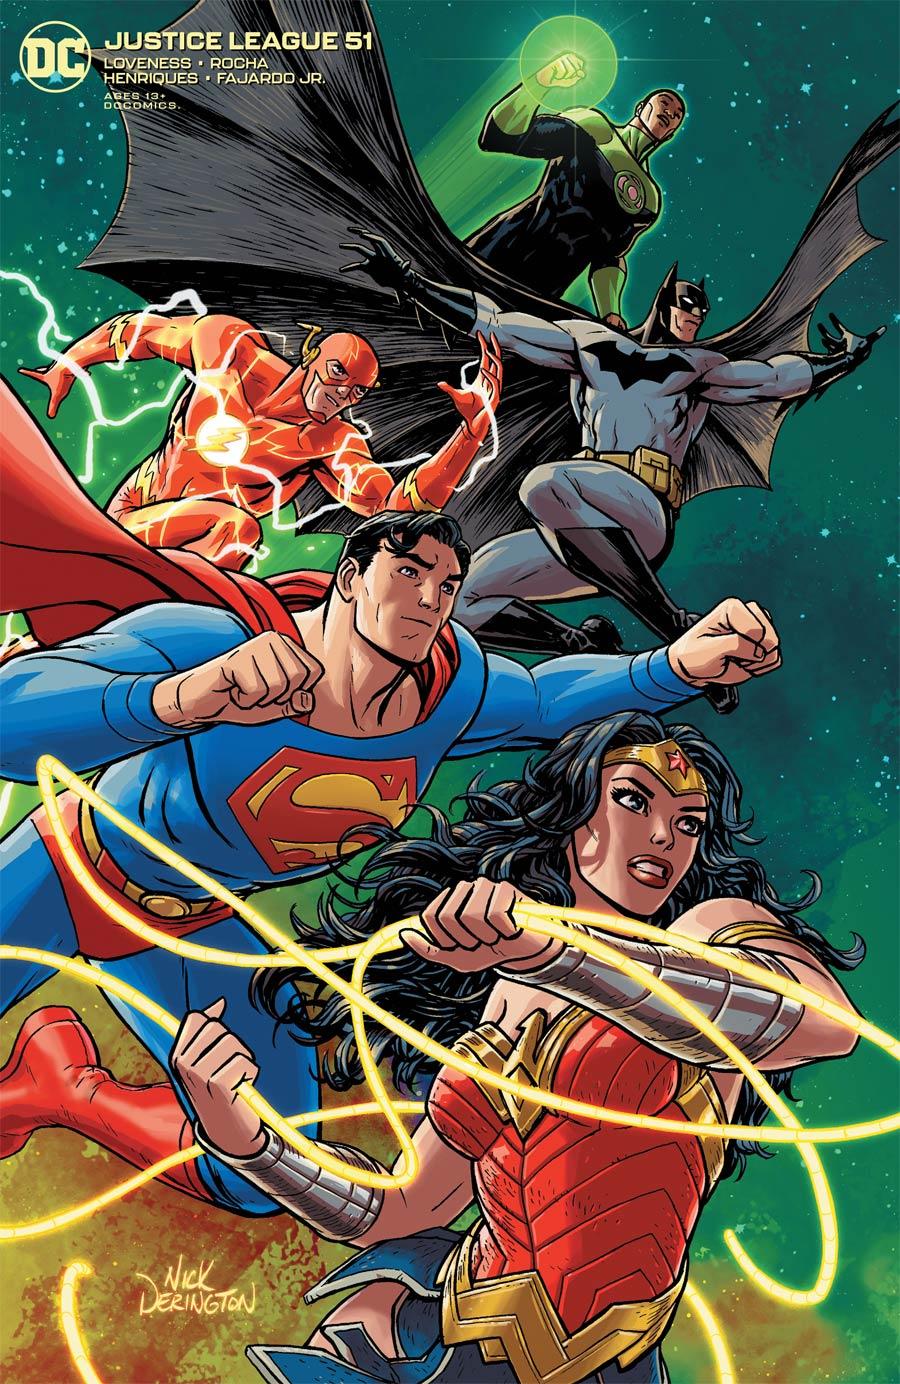 Justice League Vol 4 #51 Cover B Variant Nick Derington Cover